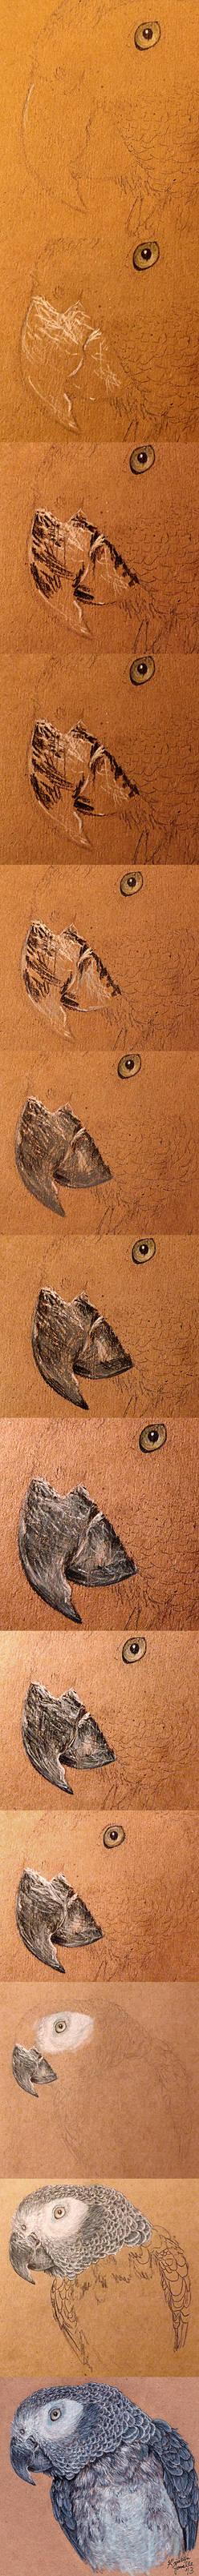 Drawing Birds - Beak Walkthrough/Tutorial